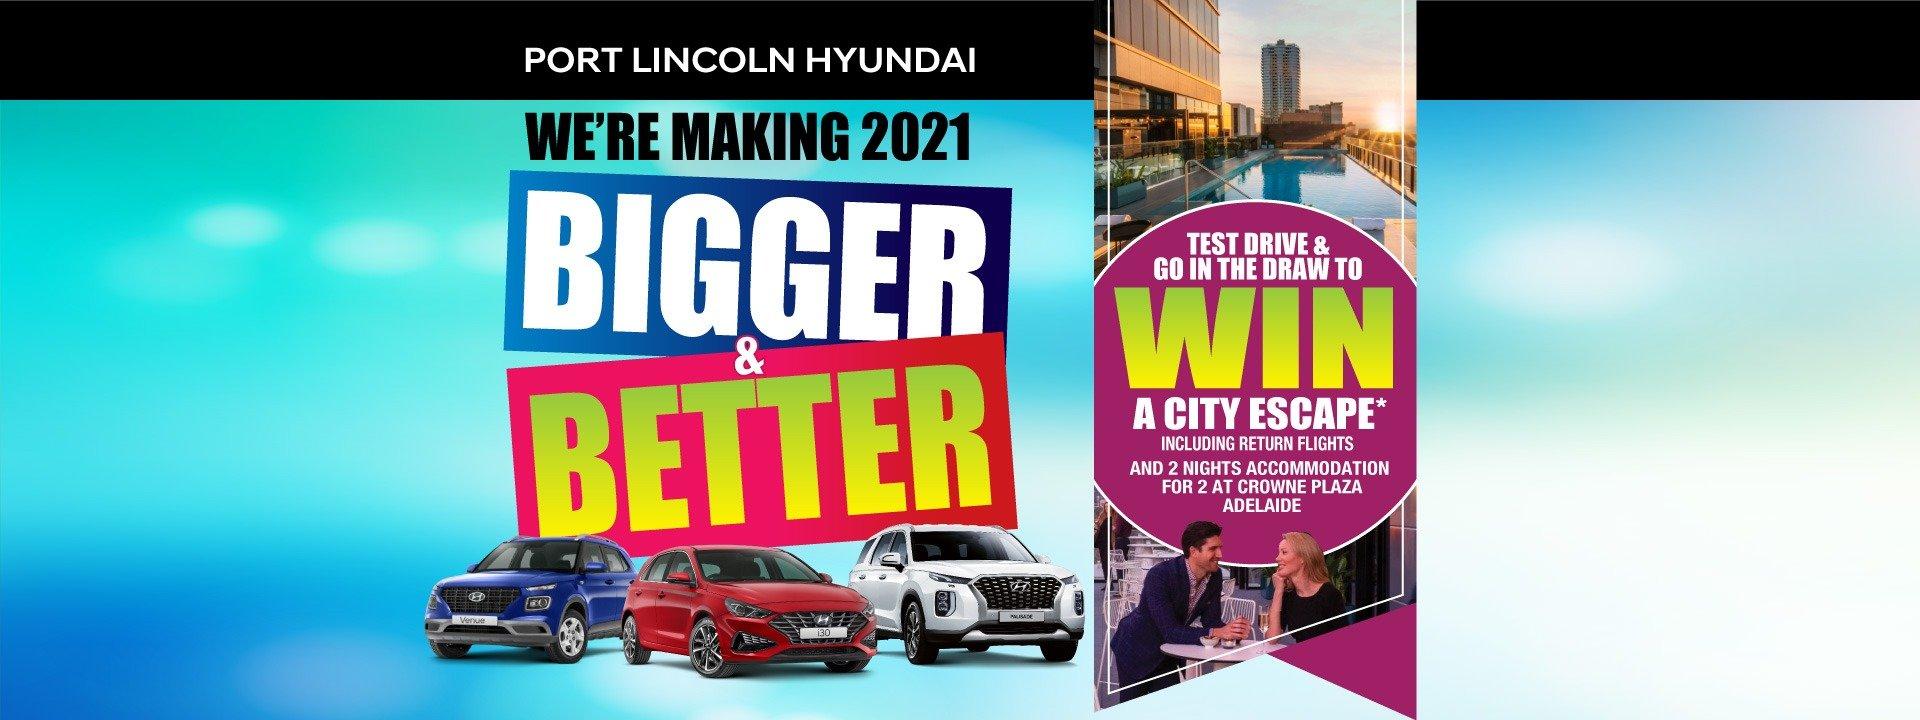 Port Lincoln Hyundai | Bigger & Better Special